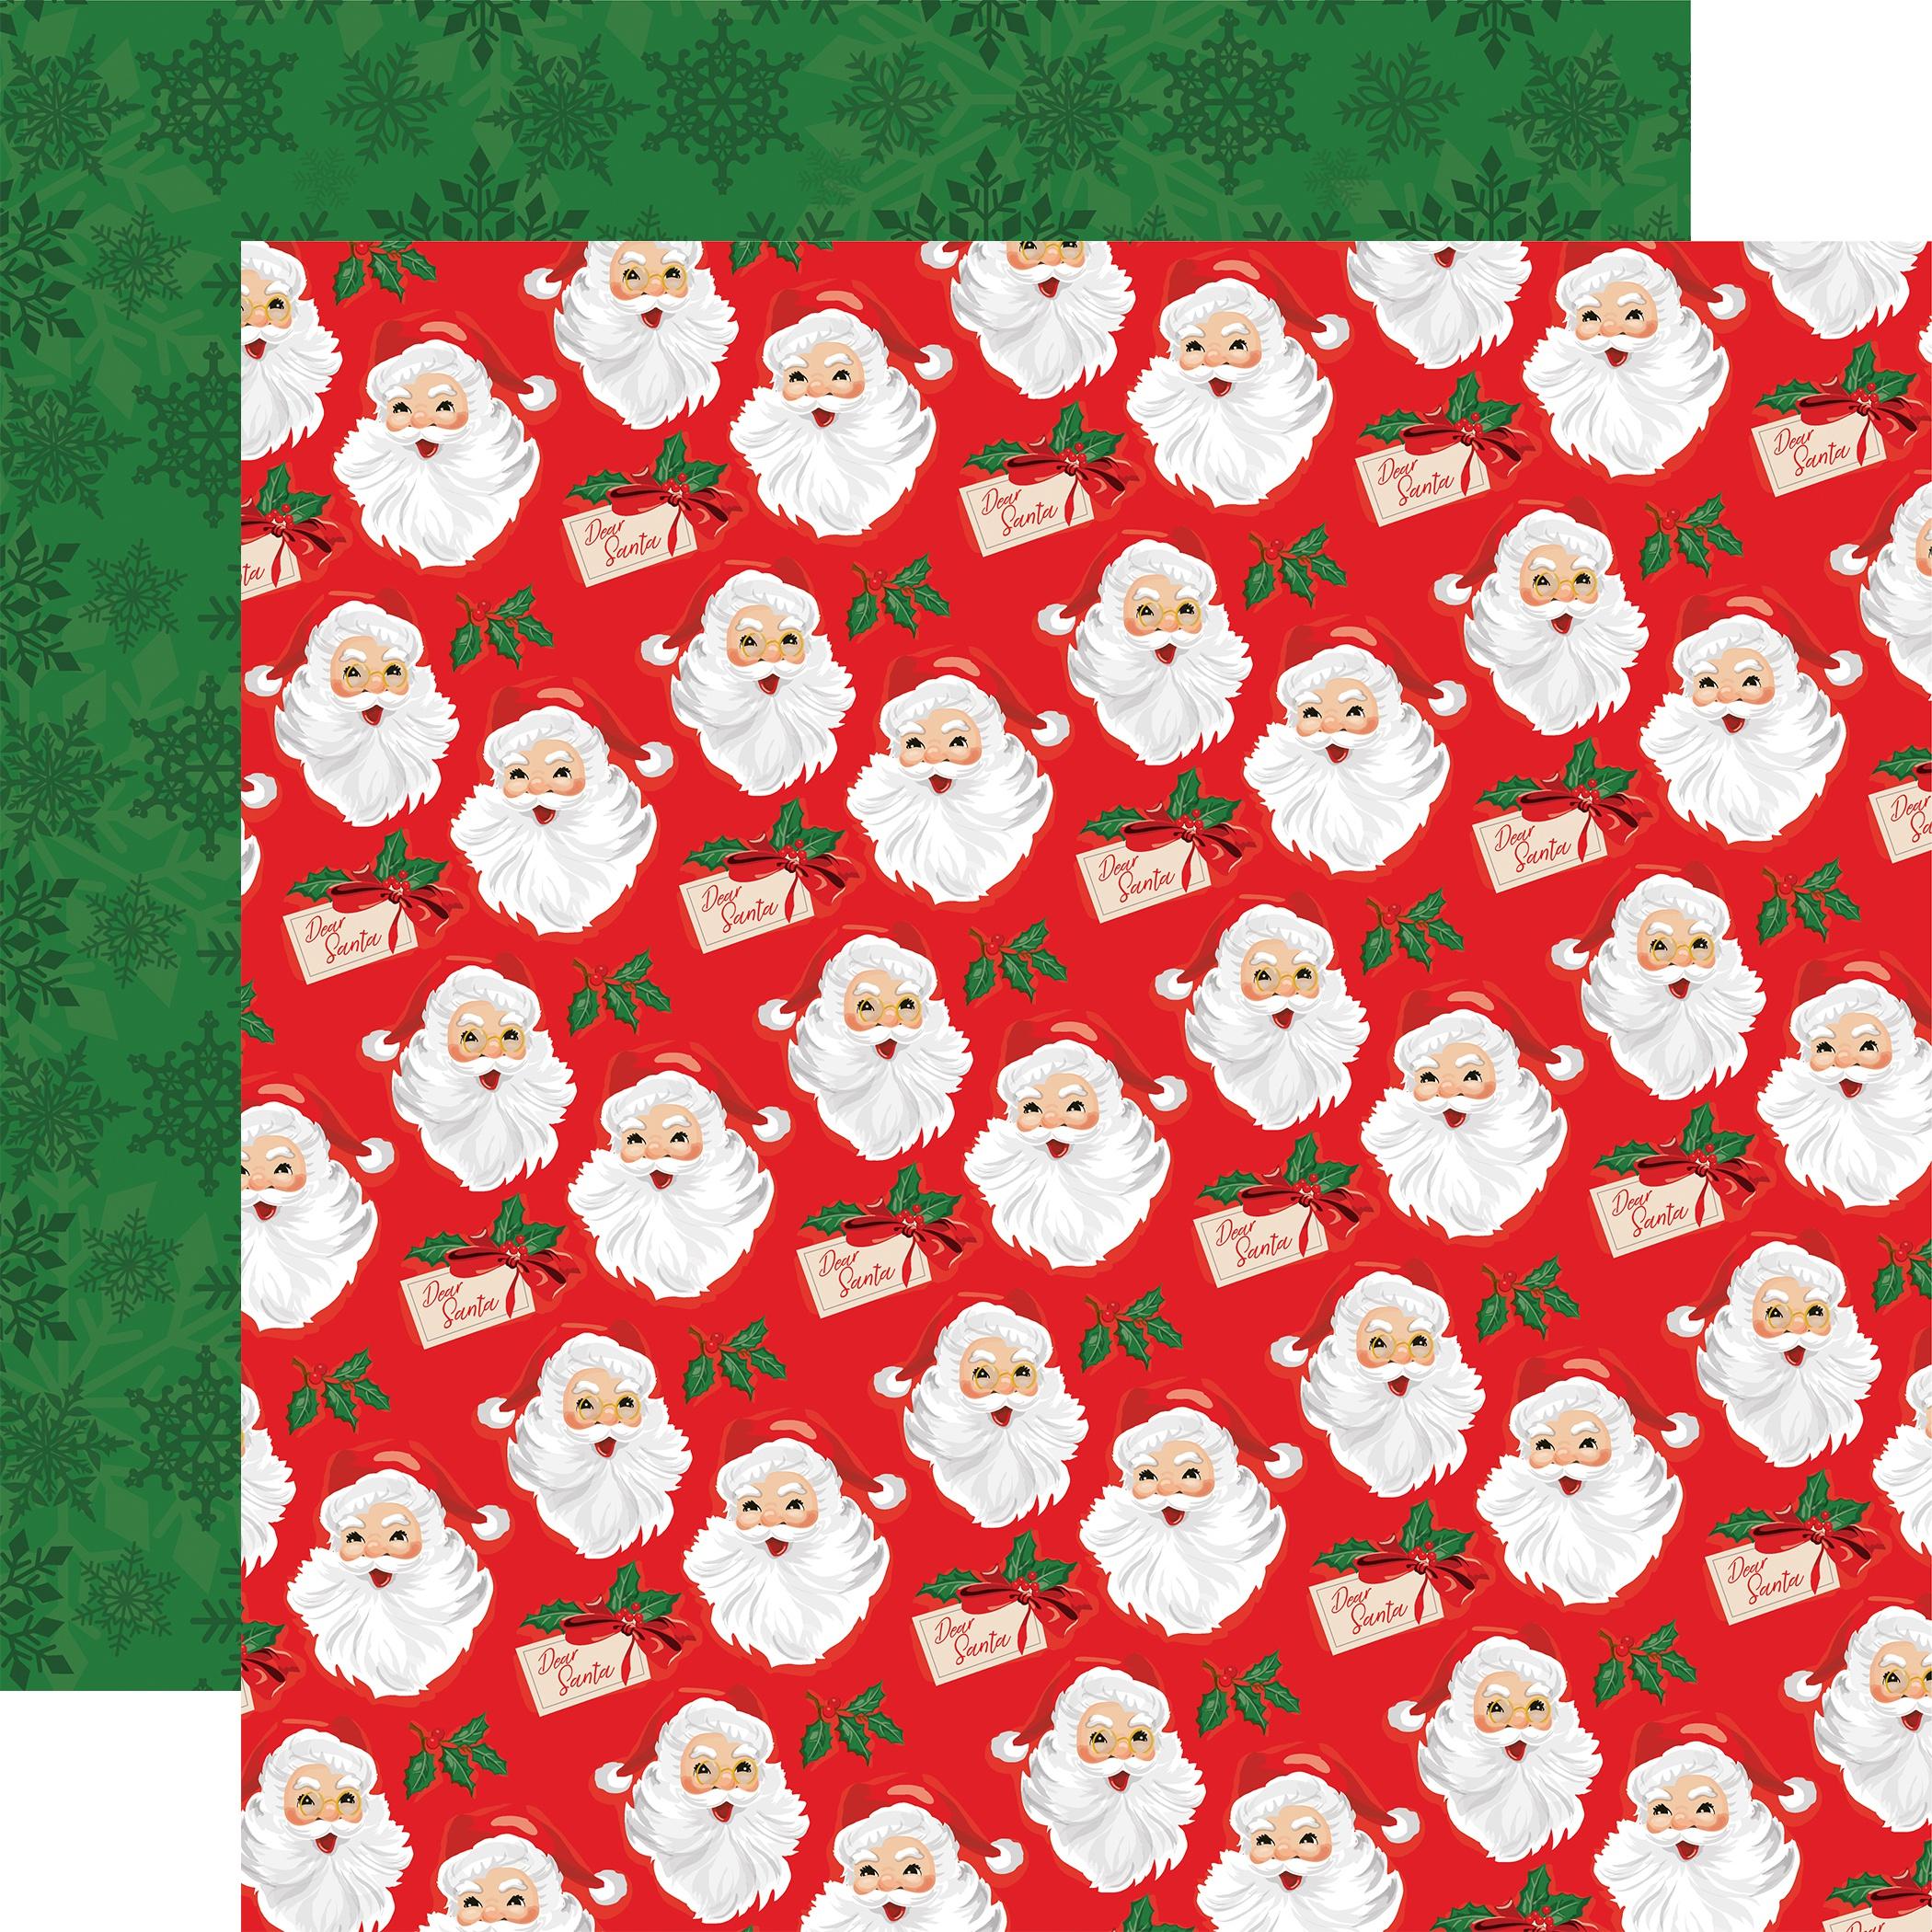 Carta Bella Dear Santa Double-Sided Cardstock 12x12- Gifts For Santa